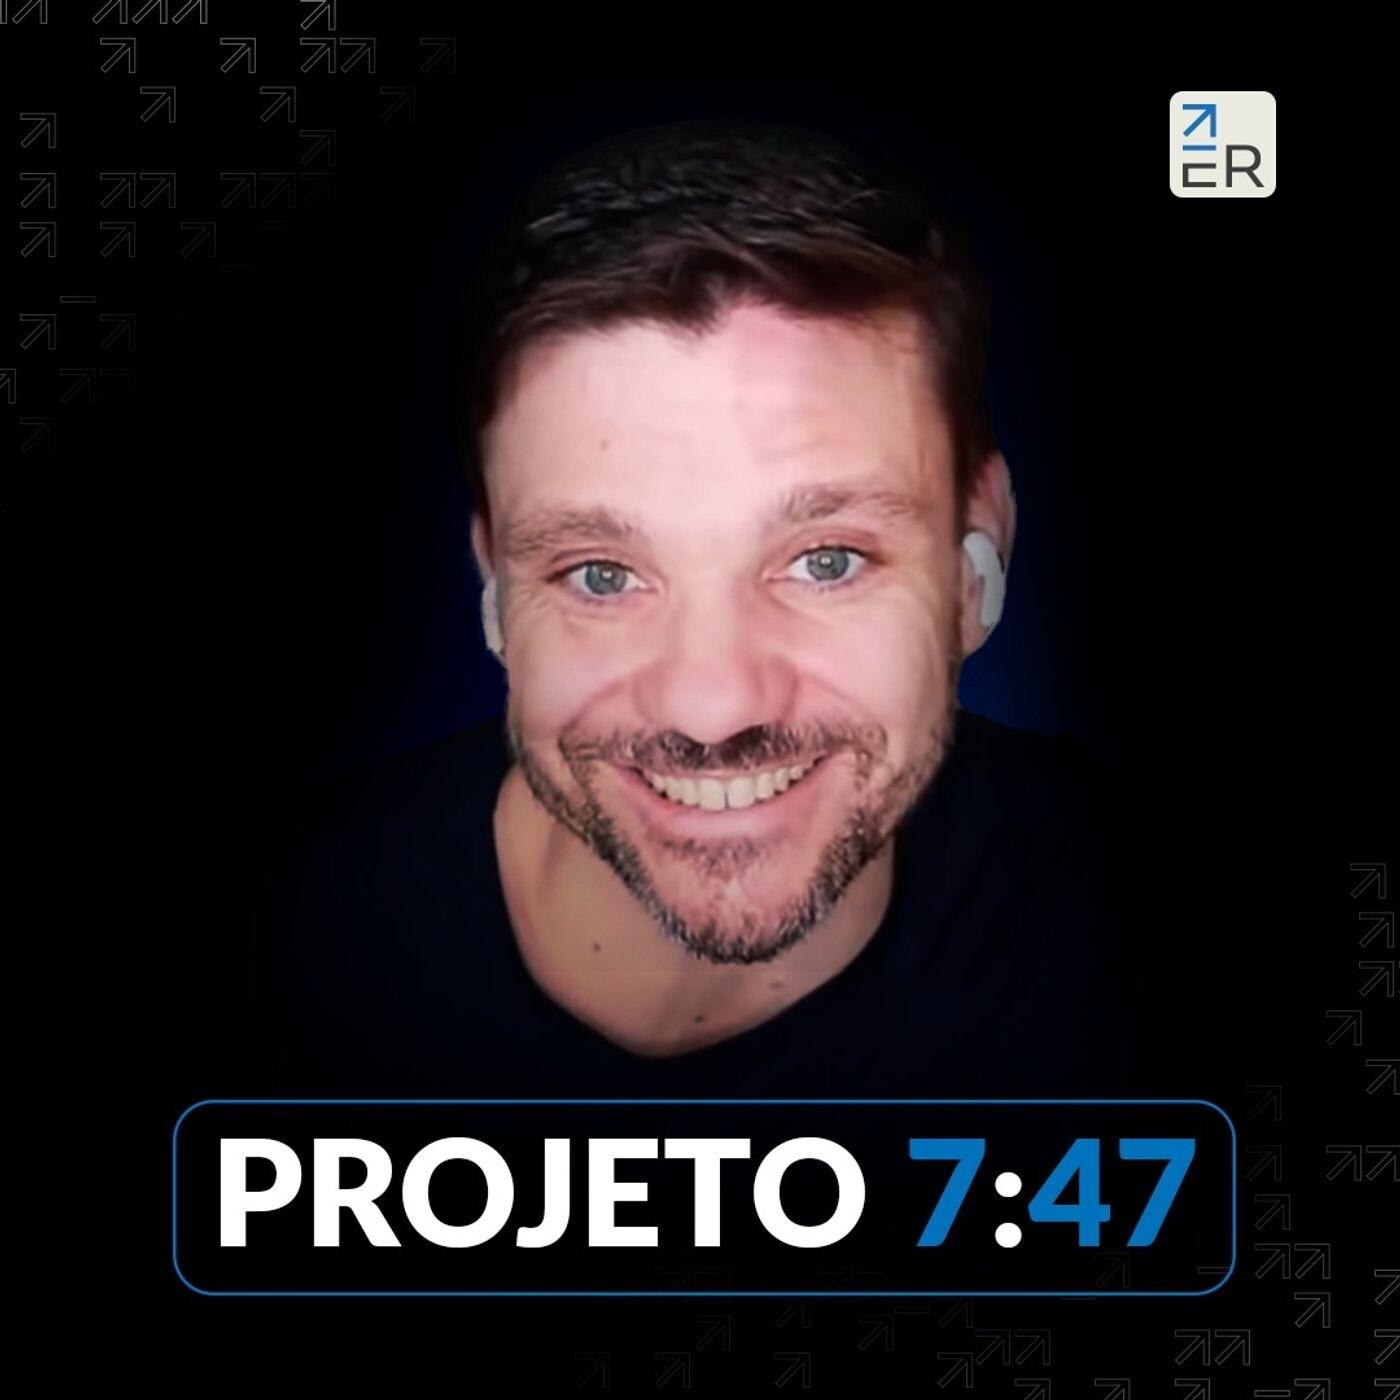 Ebook, mindset e autoridade || Projeto #747 - Episódio 61 | Erico Rocha